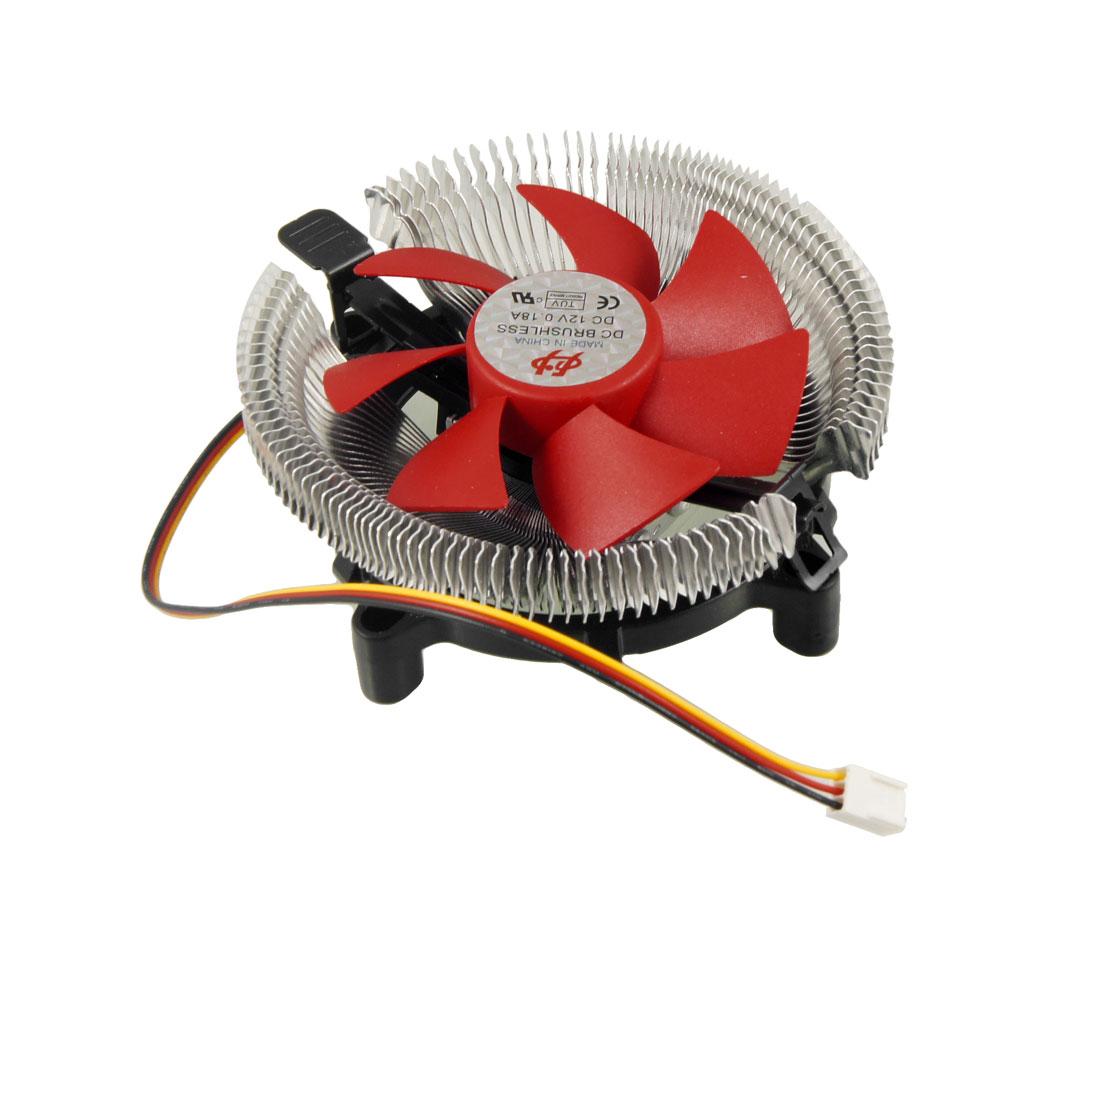 DC 12V Metal Bowl Shaped 3 Poles Connector CPU Cooler Fan for Intel LGA 775 AMD